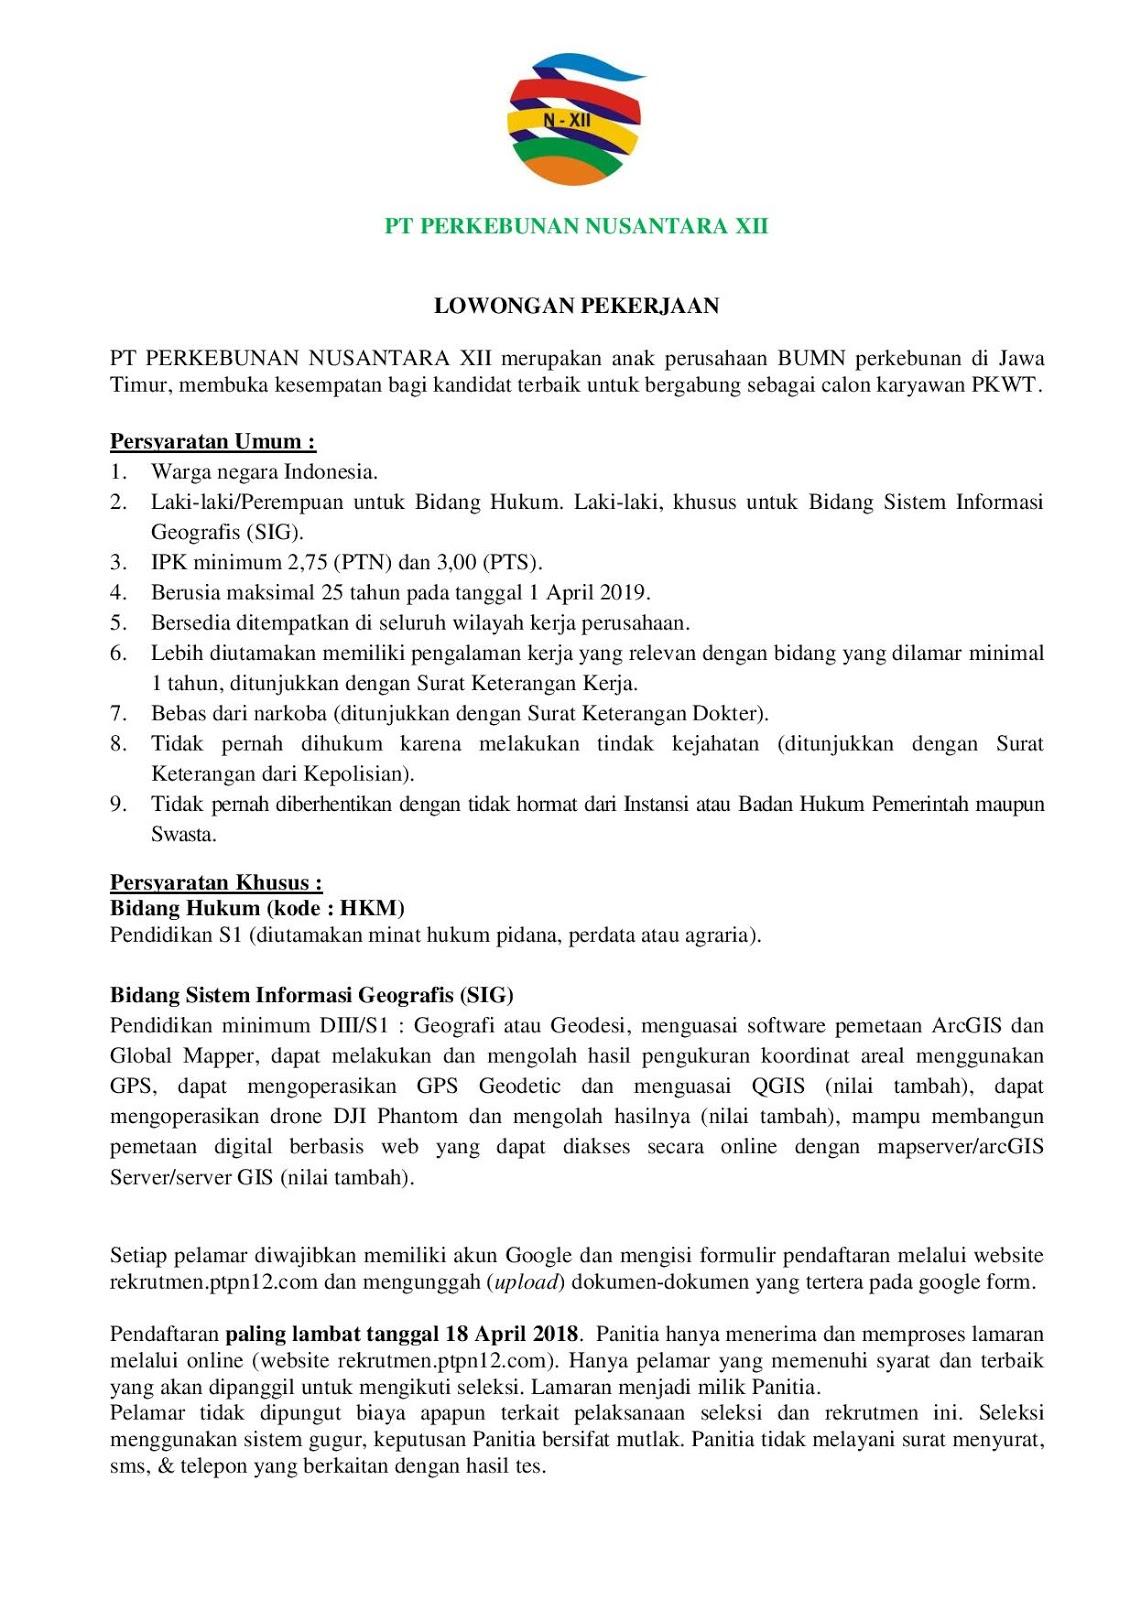 Rekrutmen PT Perkebunan Nusantara XII (Persero) April 2019